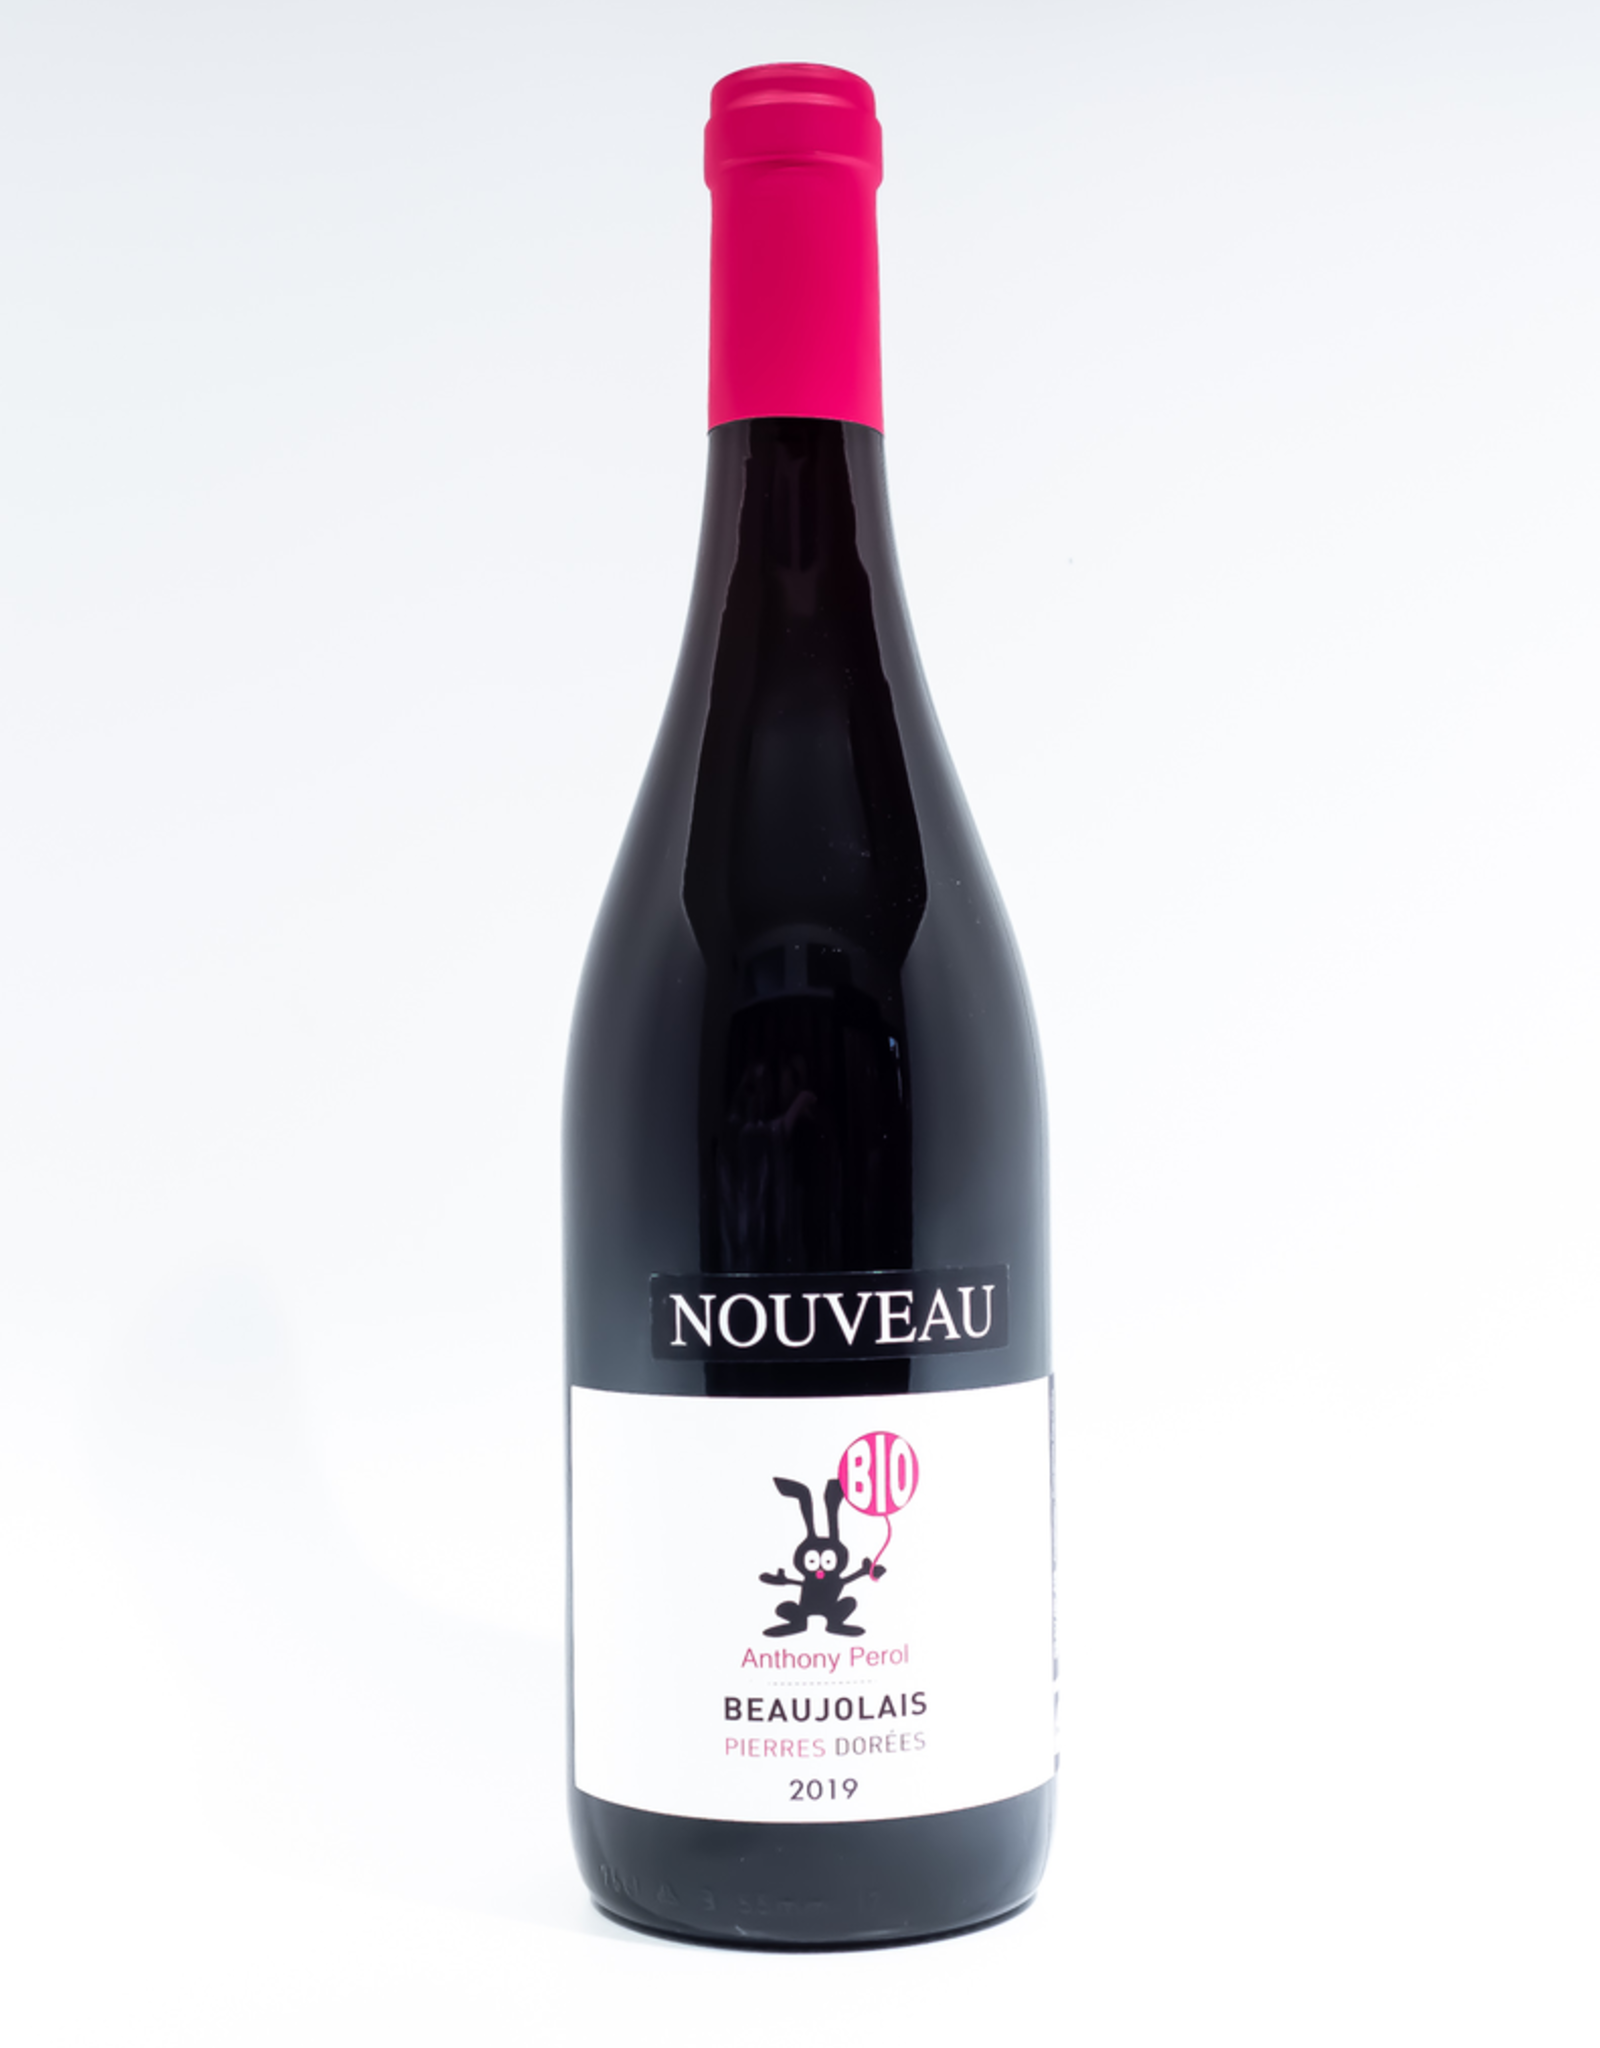 Wine-Red-Light Anthony Perol Beaujolais AOC Nouveau 2019